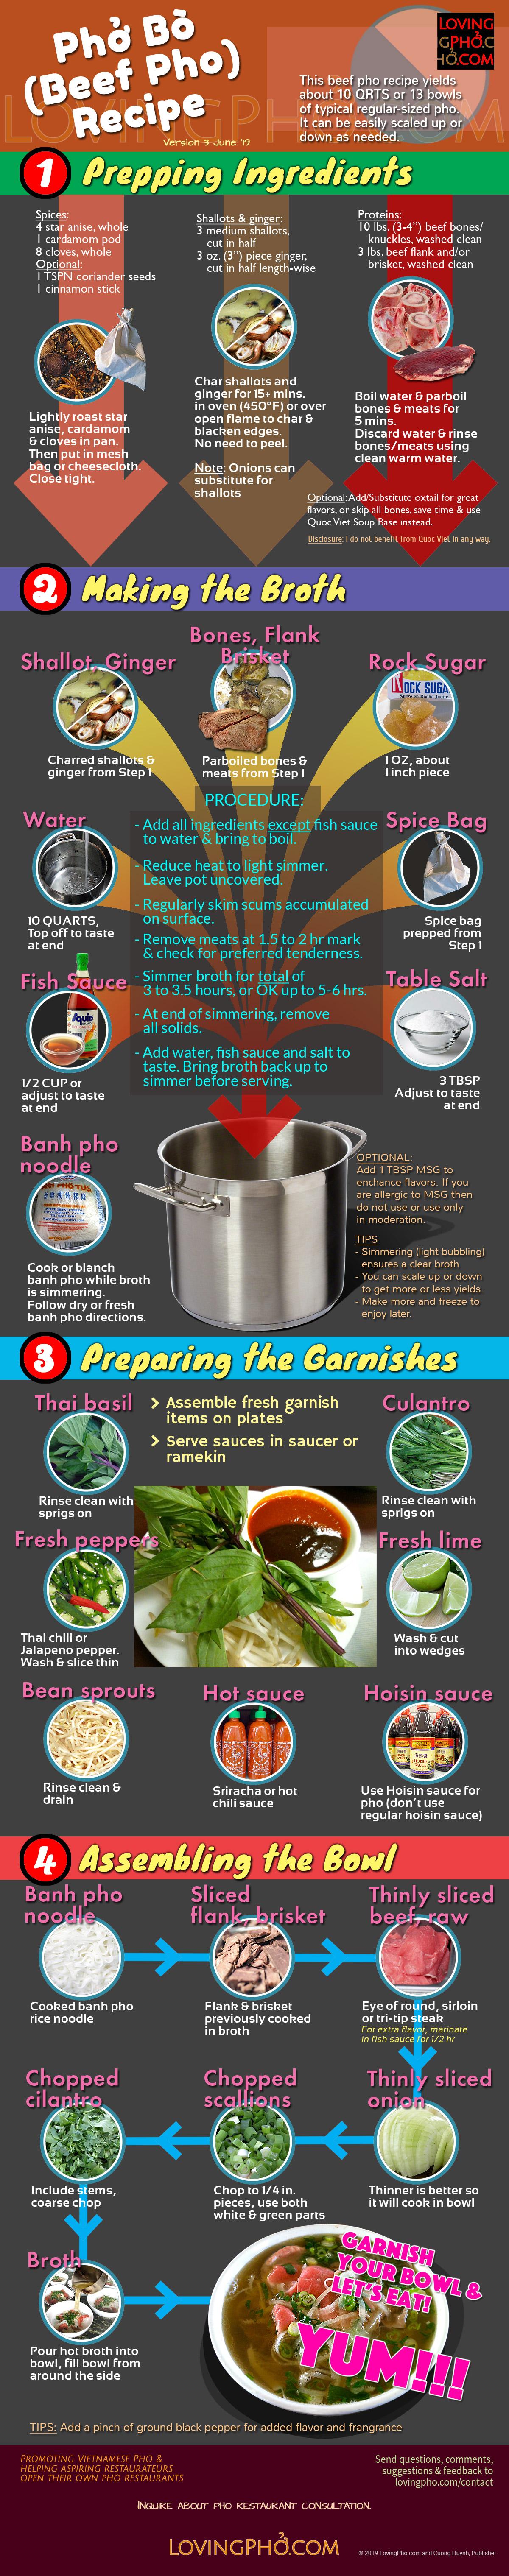 Pho bo recipe infographic by lovingpho.com